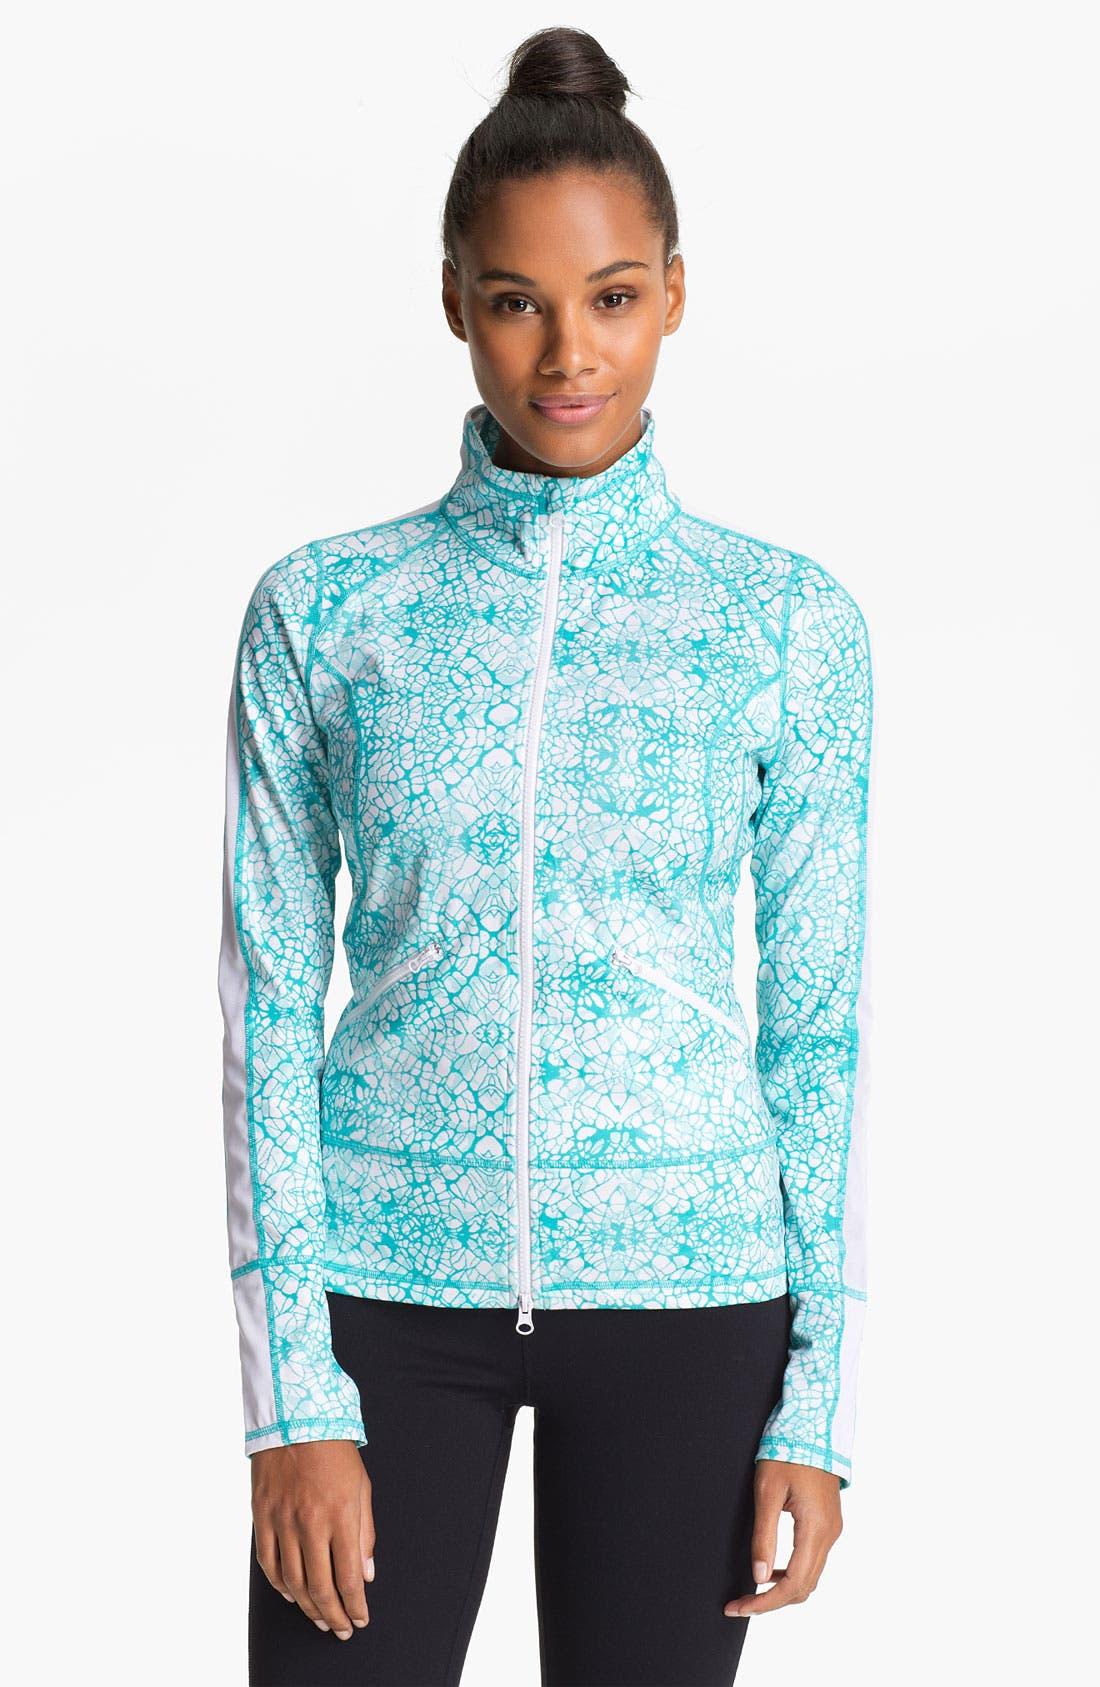 Alternate Image 1 Selected - Zella 'Streamline' Print Jacket